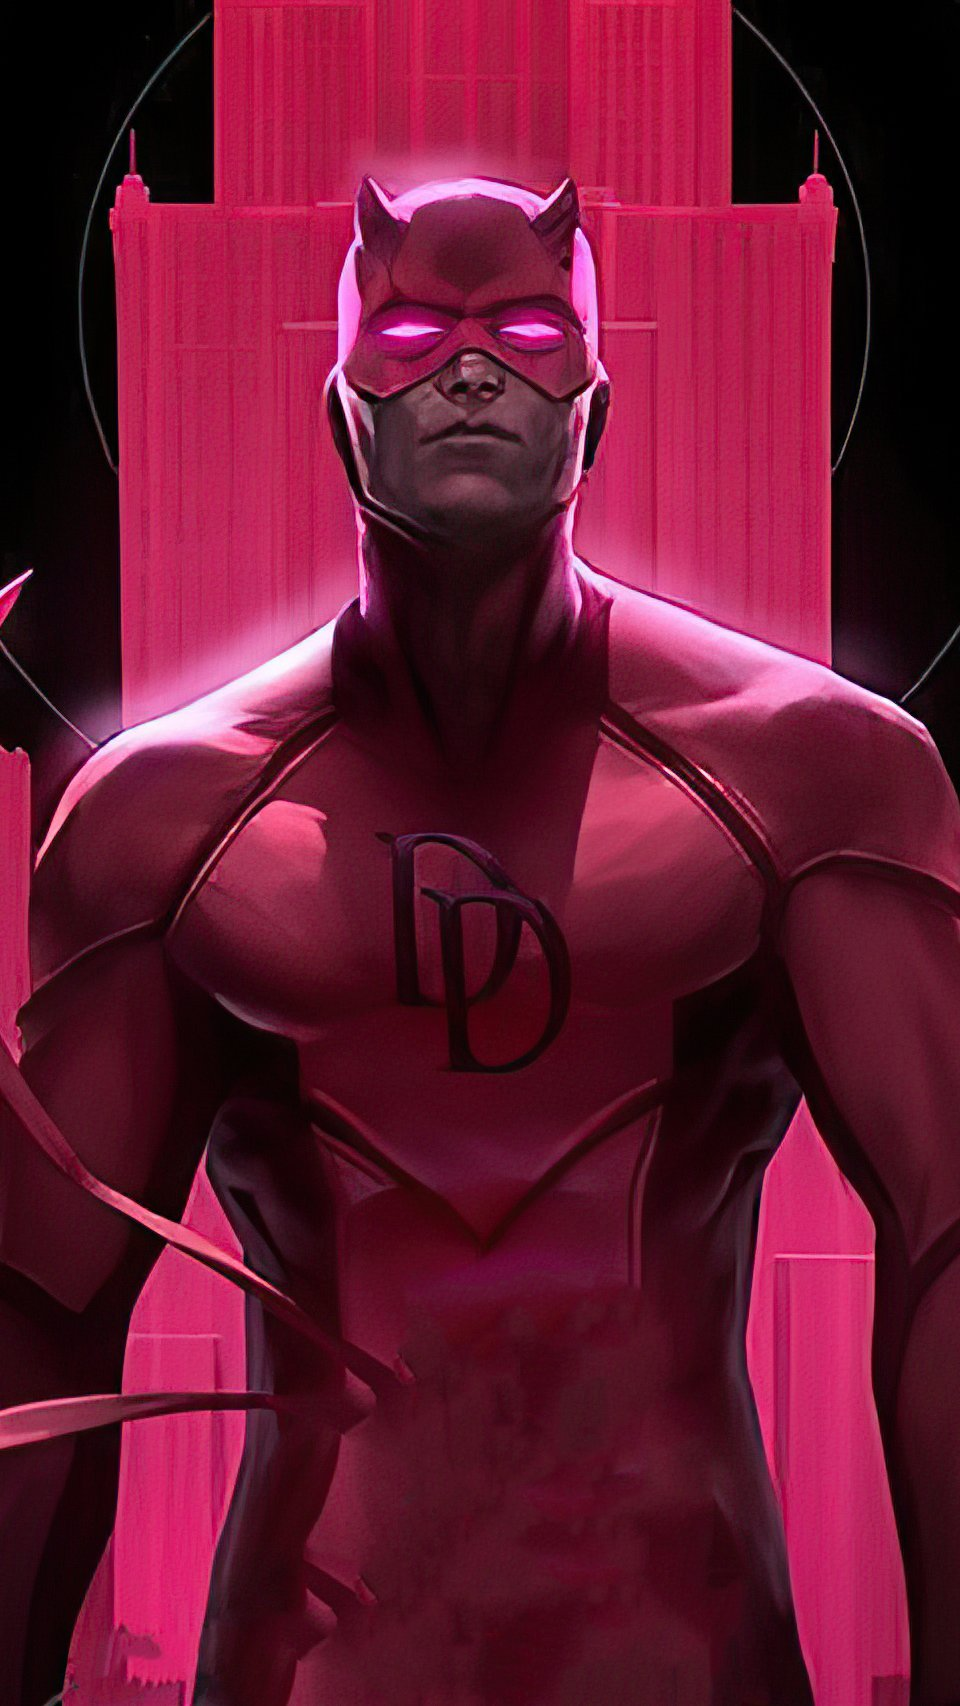 Fondos de pantalla Daredevill en rosa Vertical